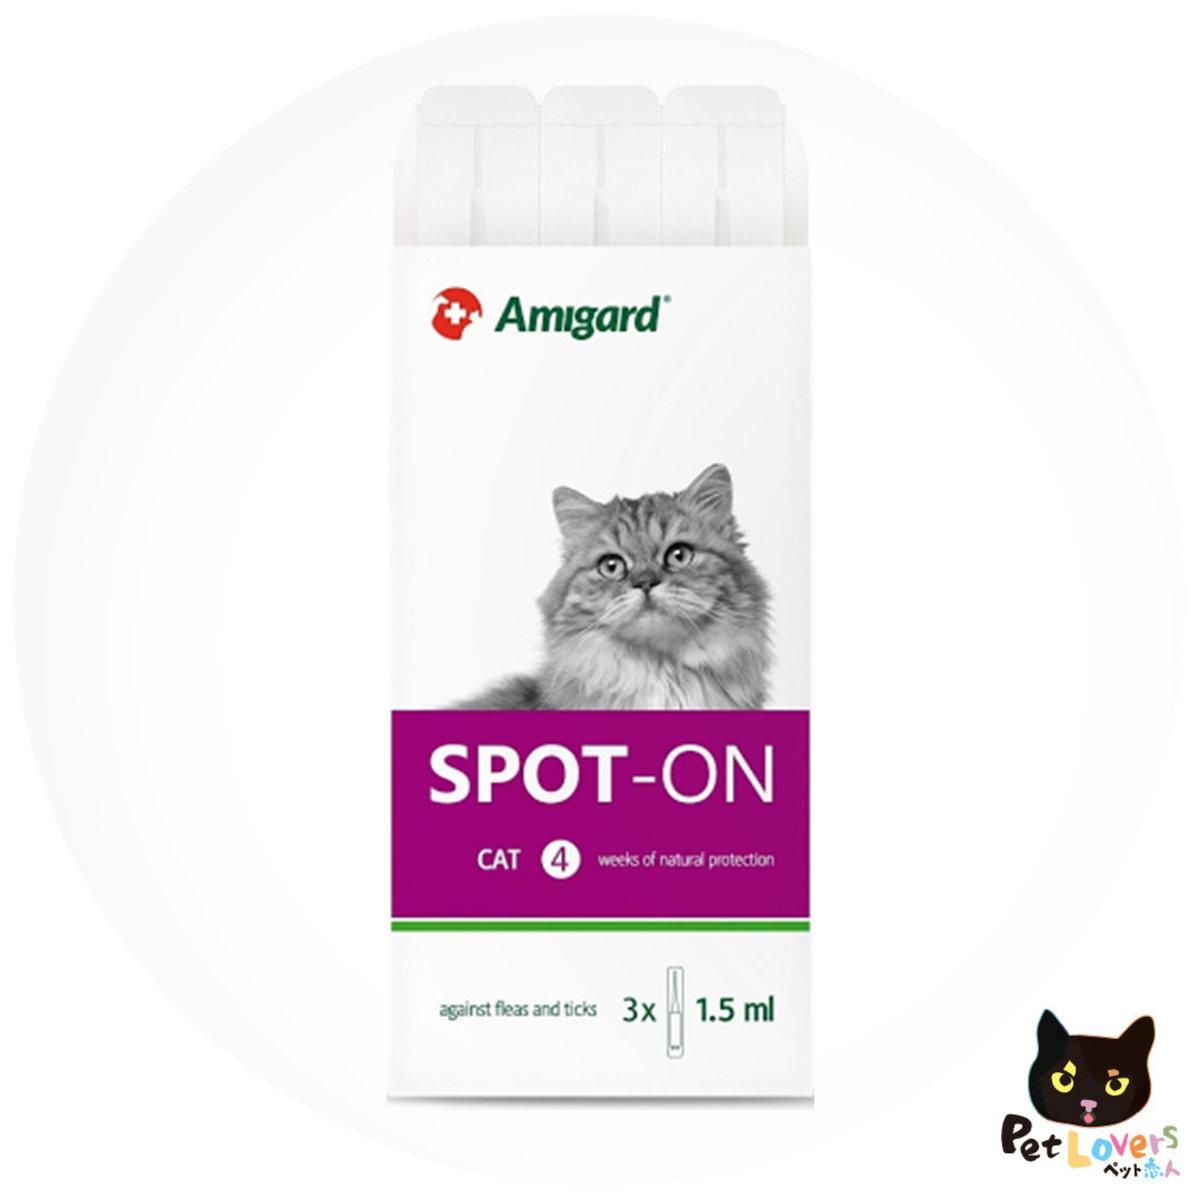 Spot-on for Cat Over 2months or Older